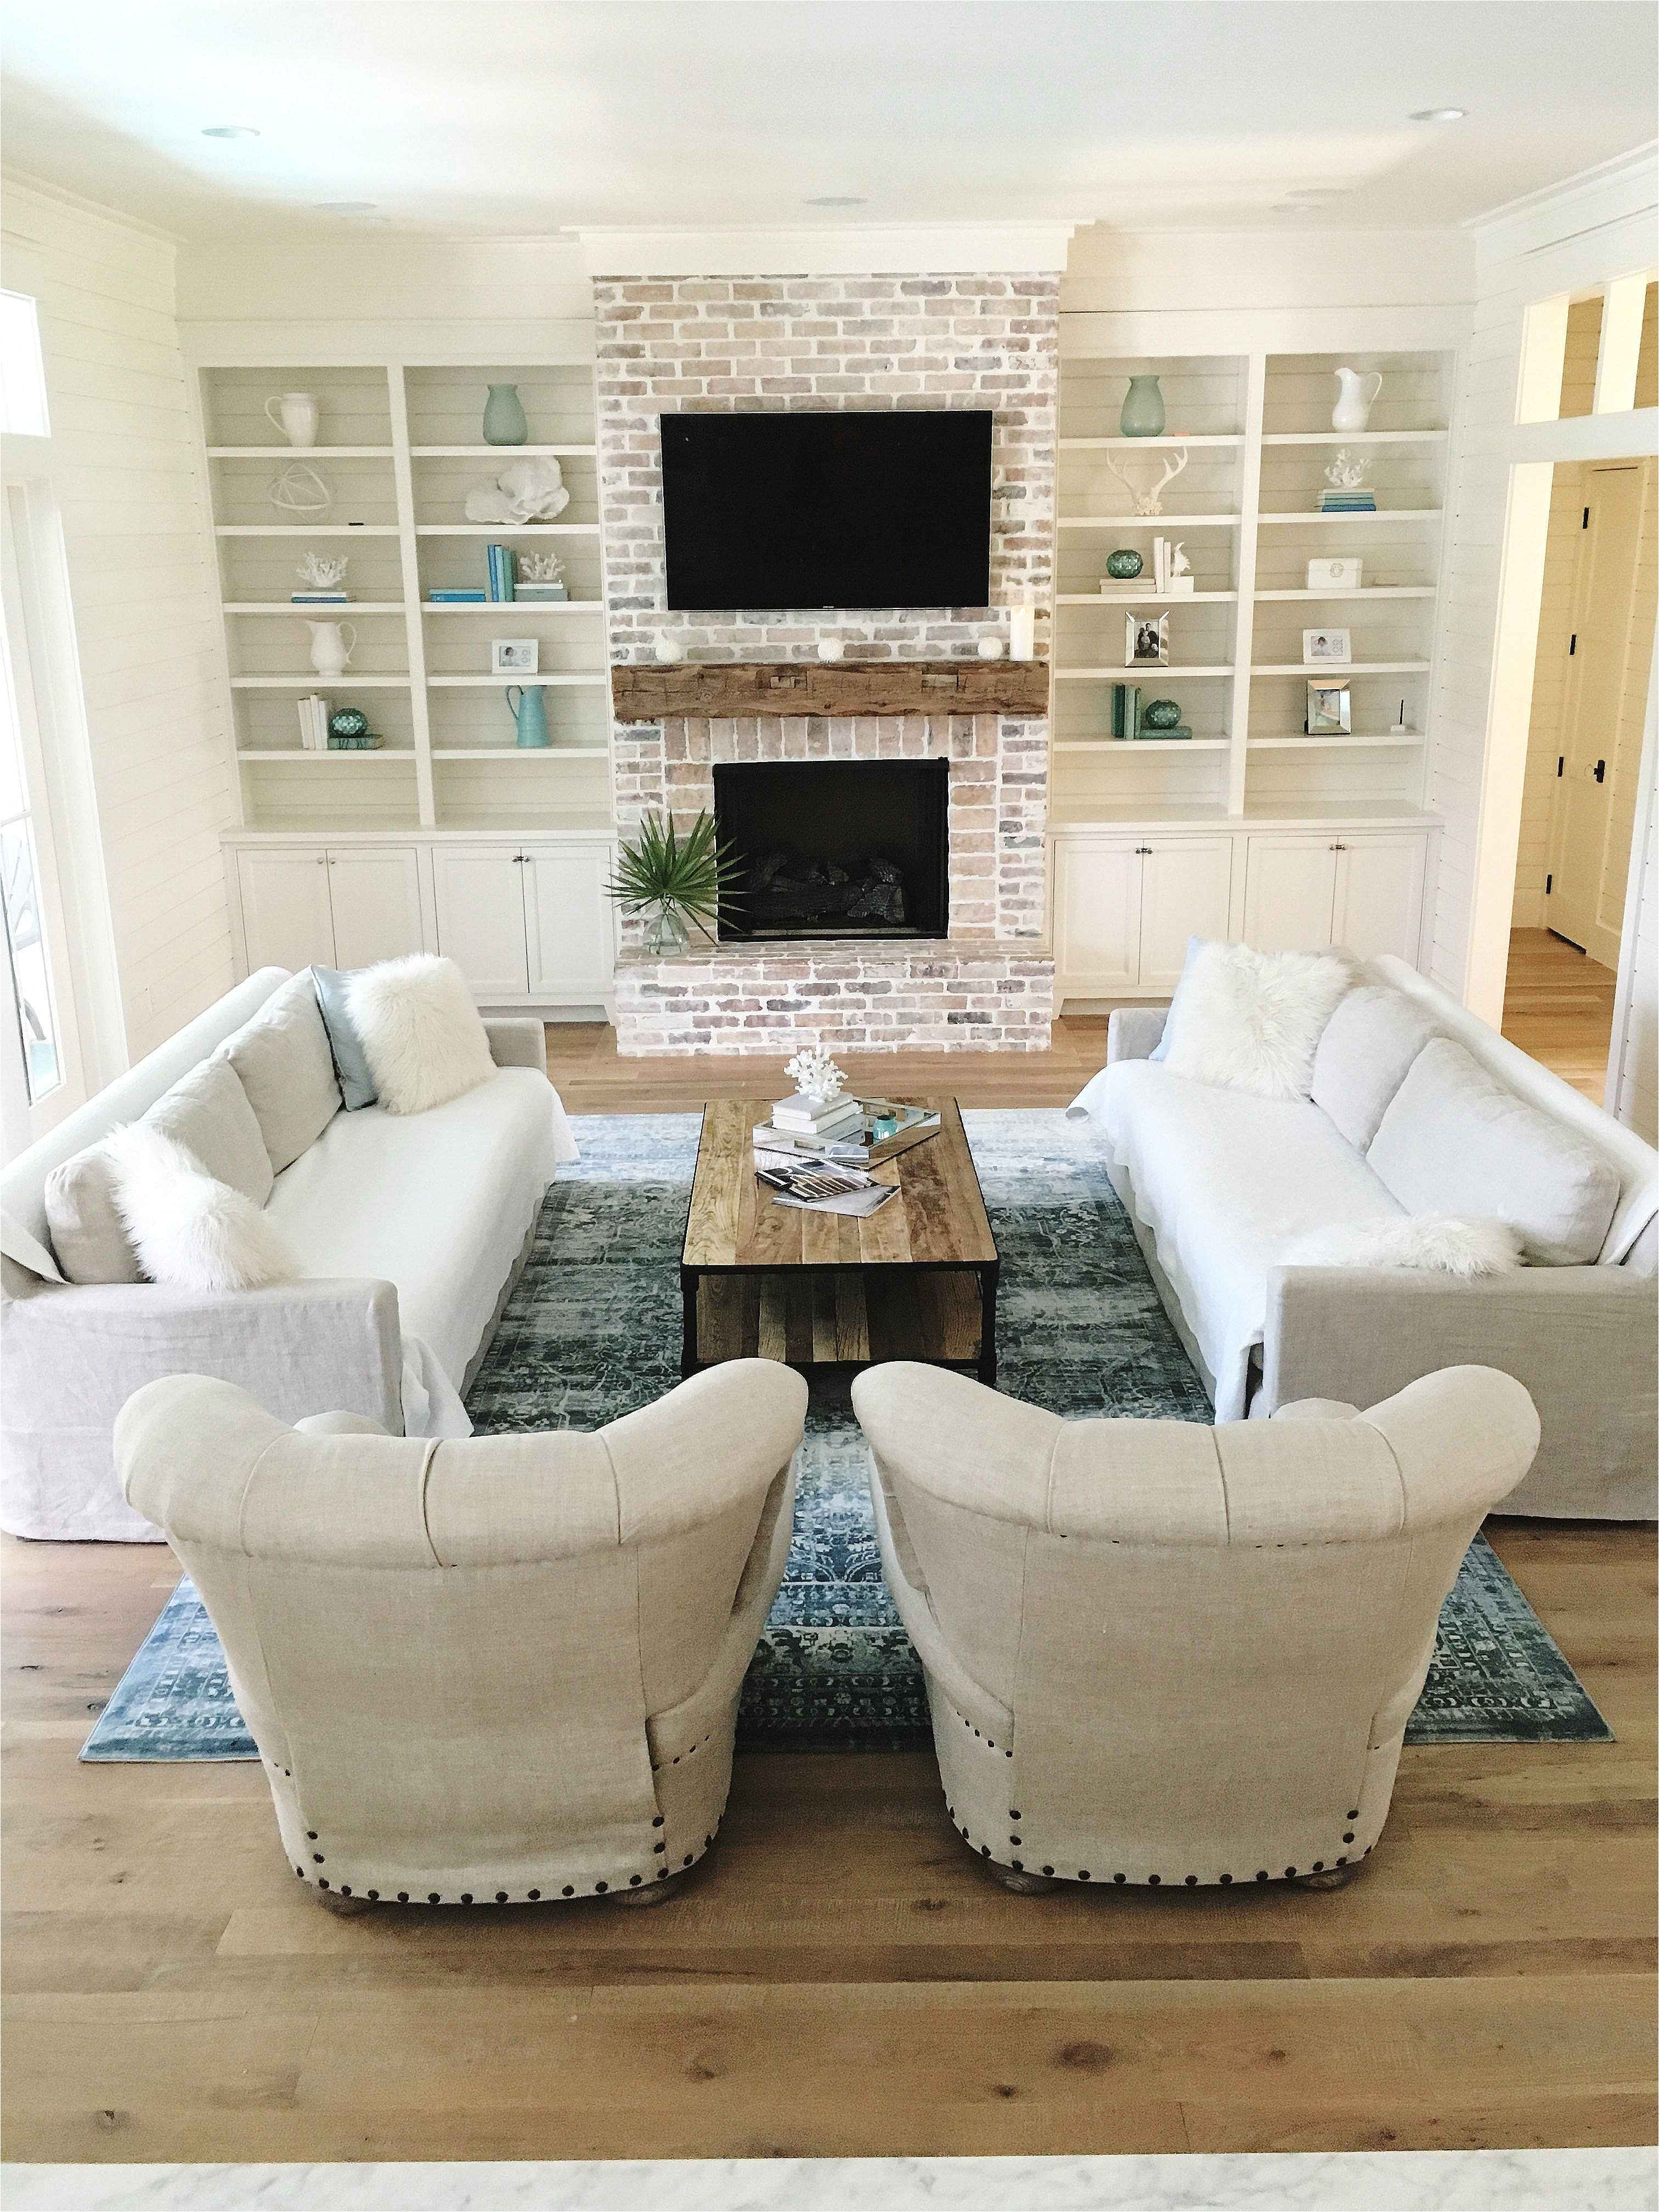 Ikea Living Room Table Grey Couch Living Room Decor Inspirational Salon Zdja A Cie Od Ikea